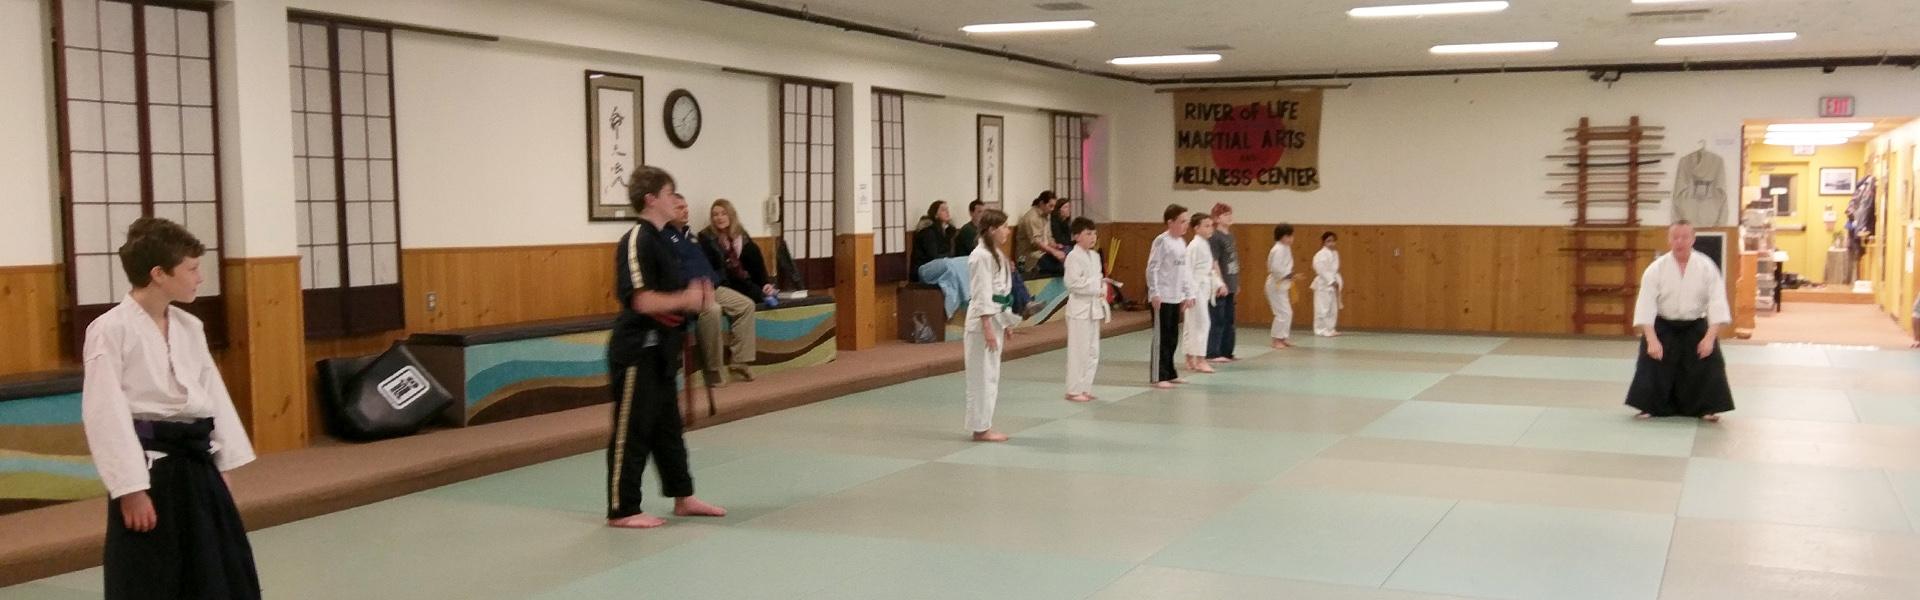 River of Life Martial Arts Center - Fort Washington Children's Aikido